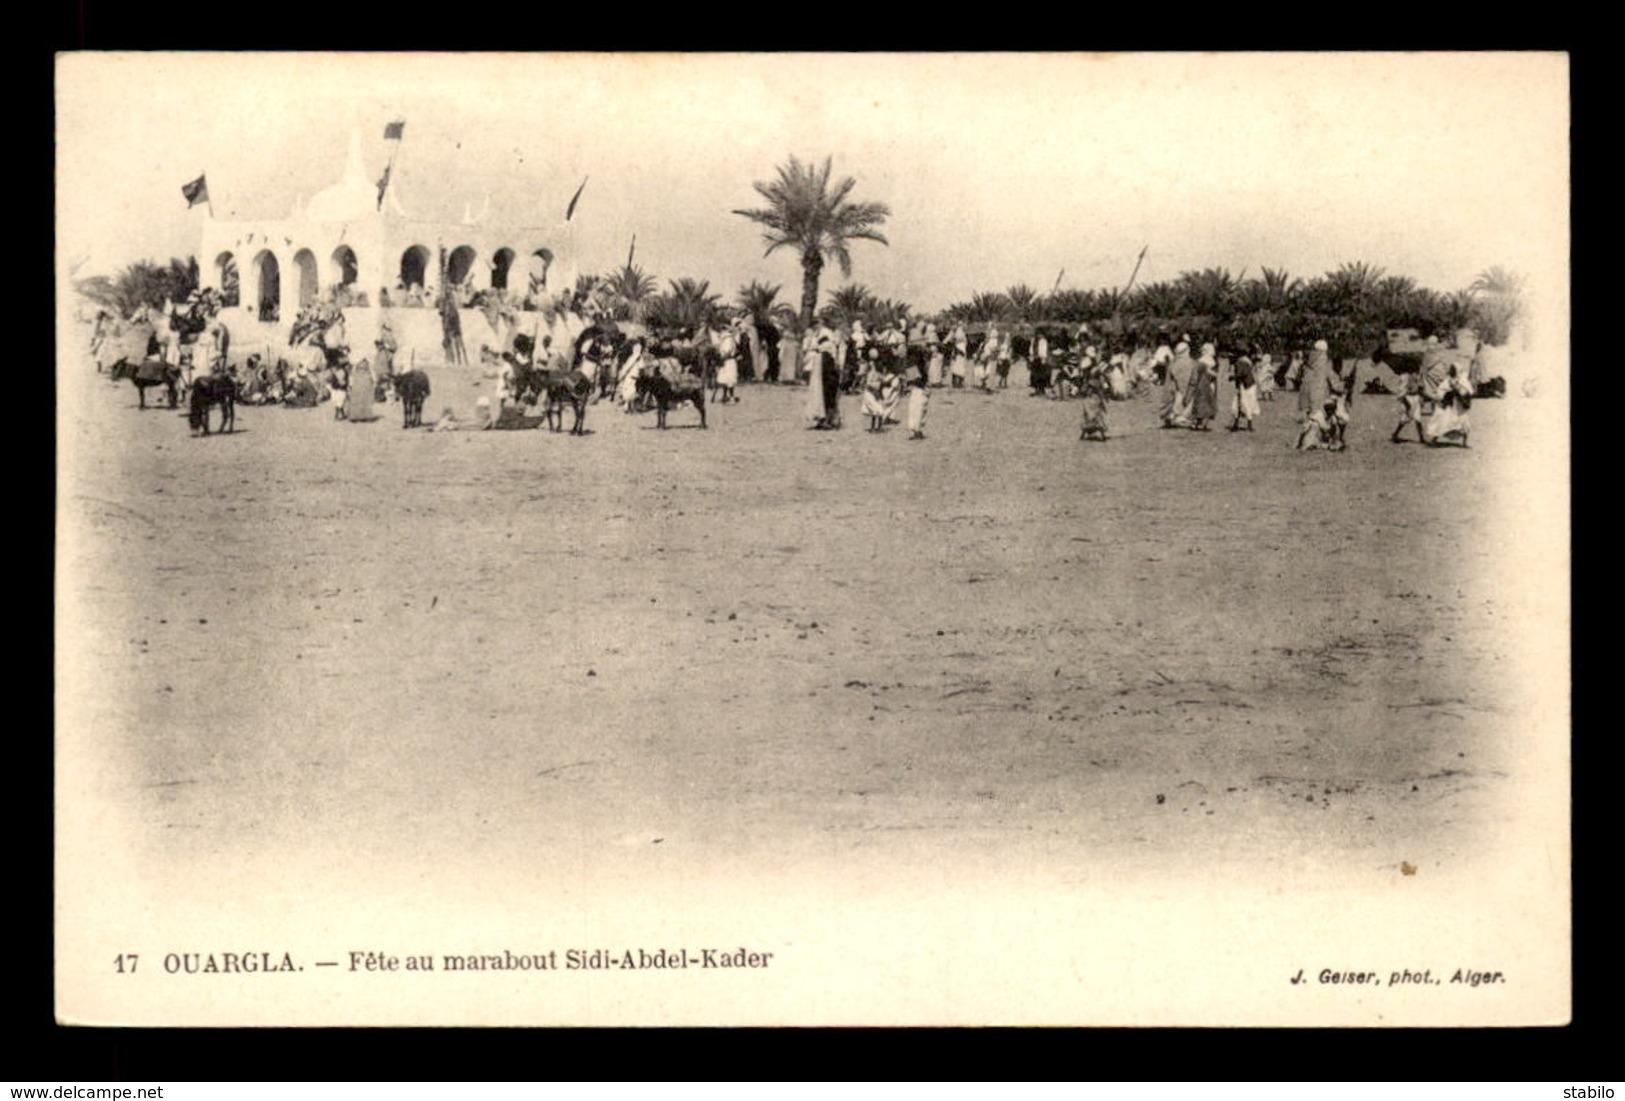 ALGERIE - SAHARA - OUARGLA - FETE AU MARABOUT DE SIDI-ABDEL-KADER - EDITEUR GEISER - Ouargla